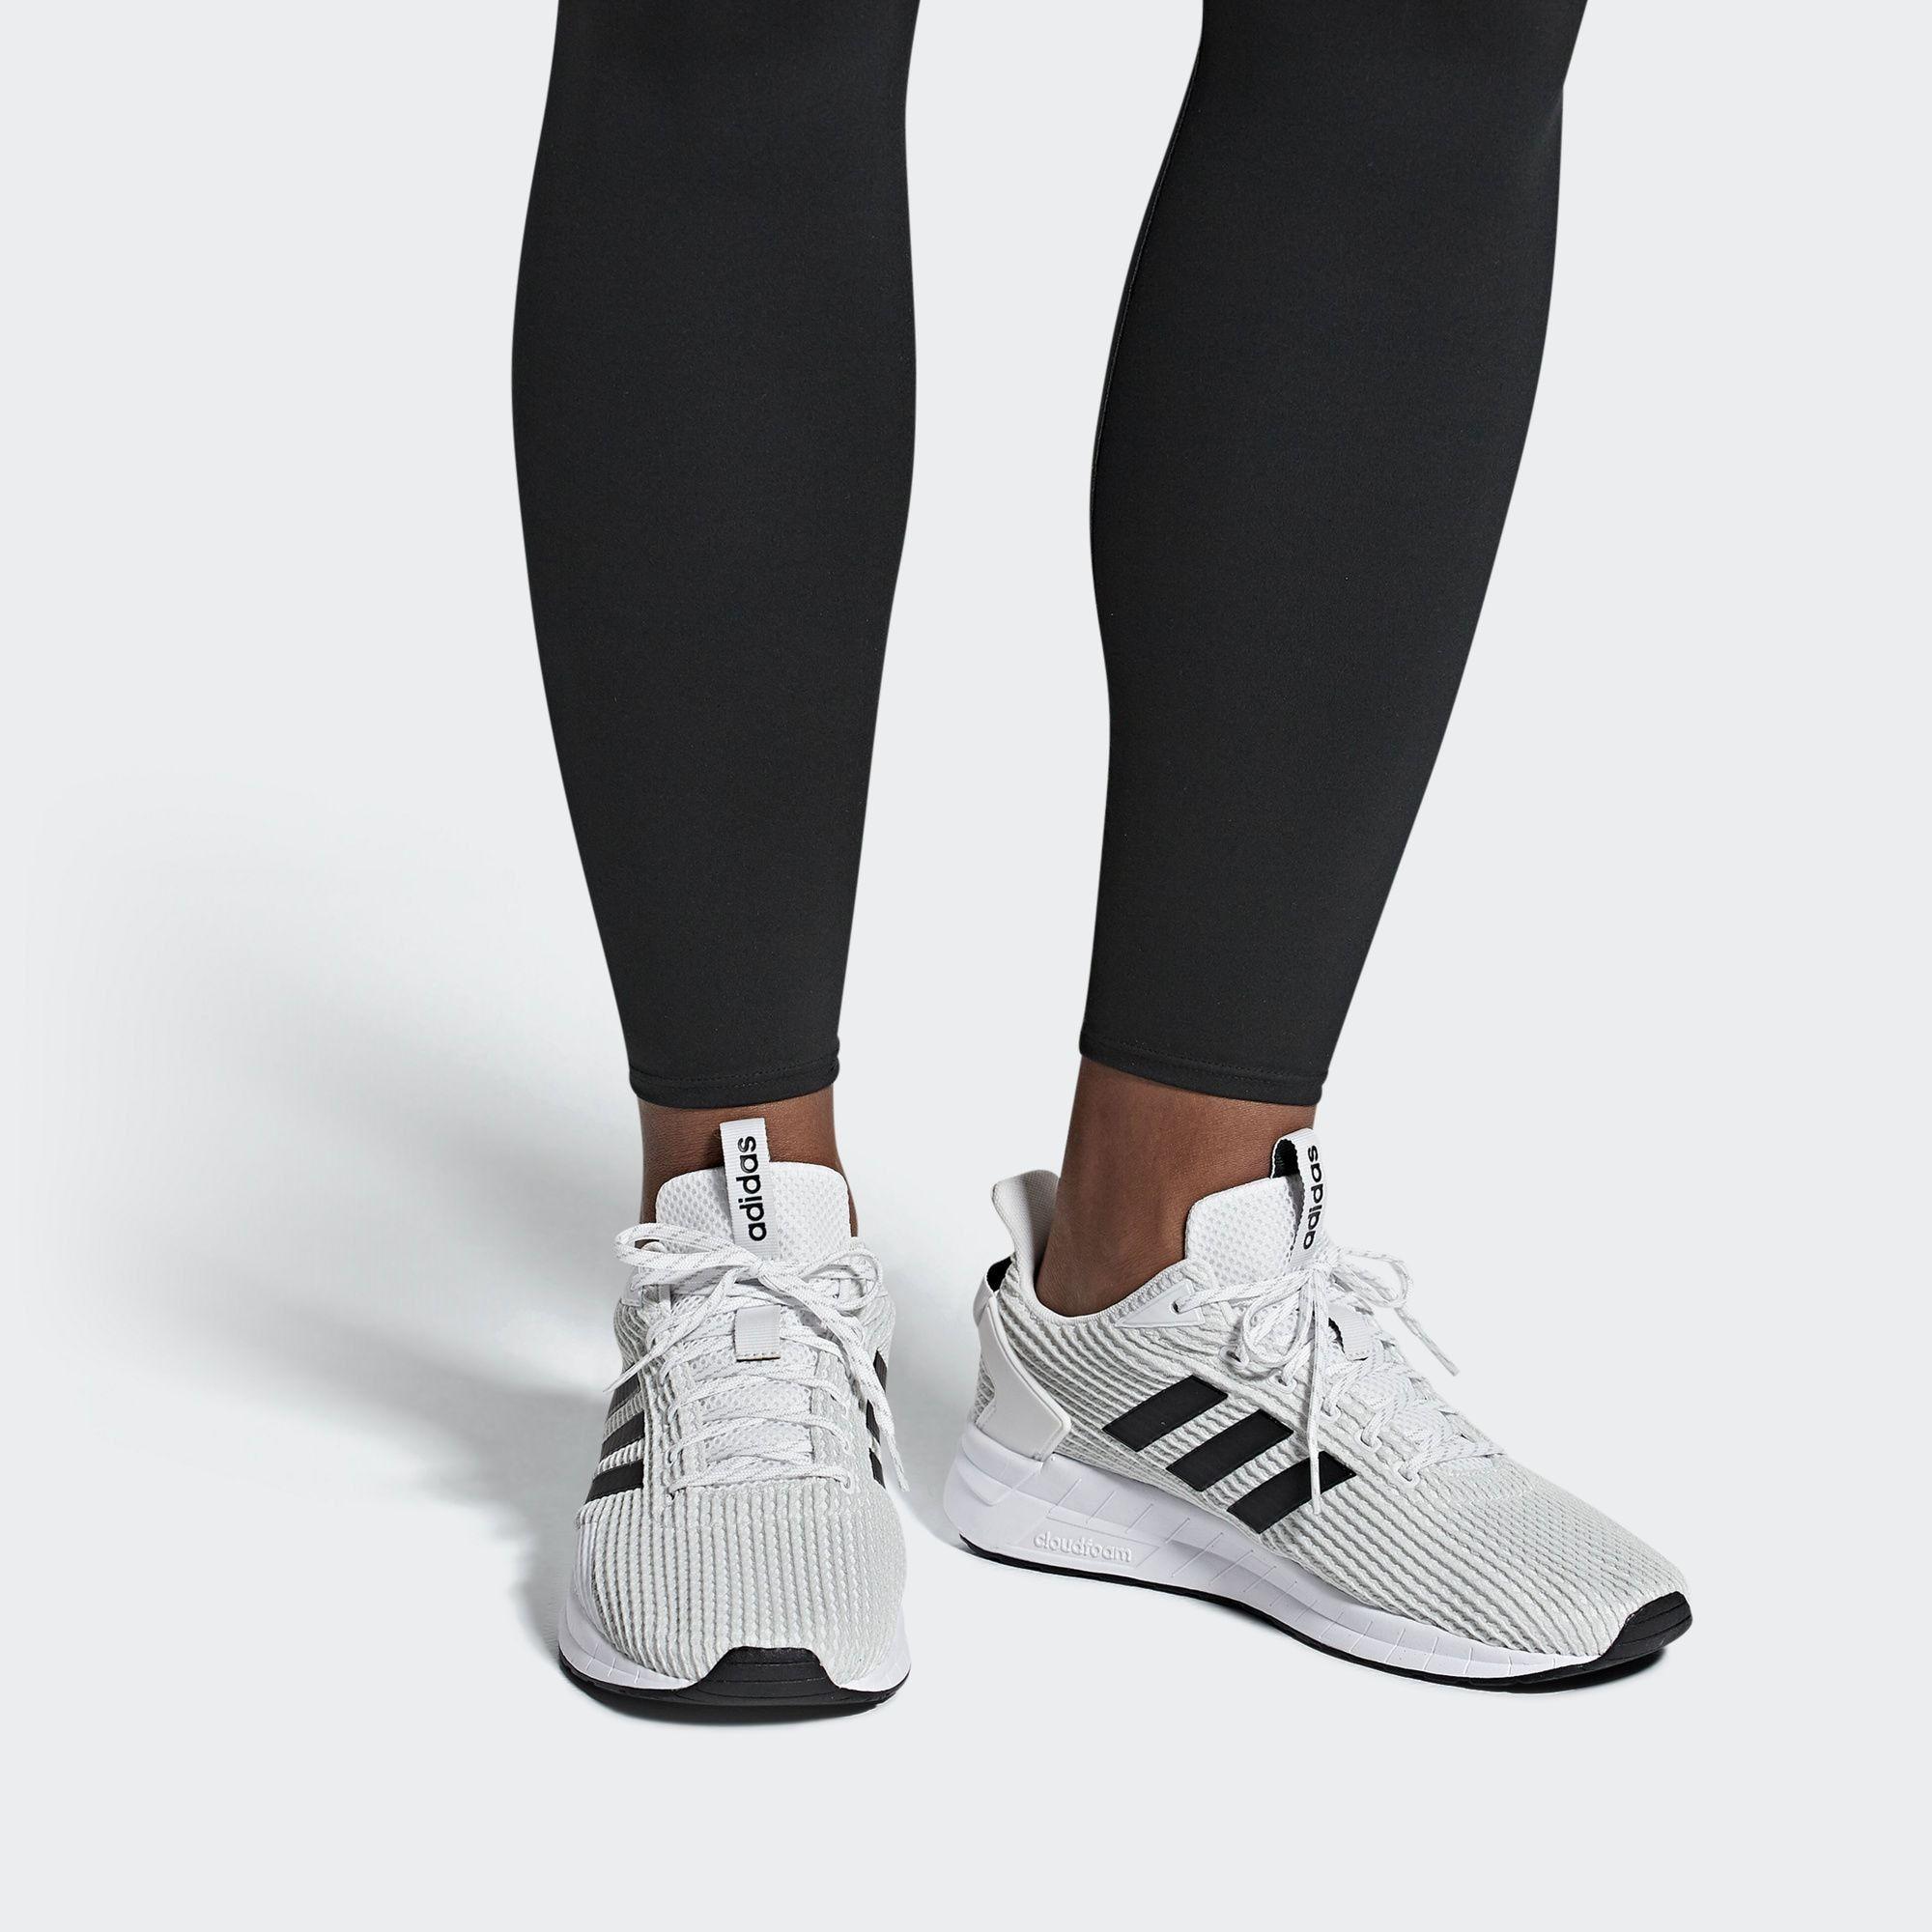 ADIDAS PERFORMANCE Sport Schuhe 'Questar Ride' Herren